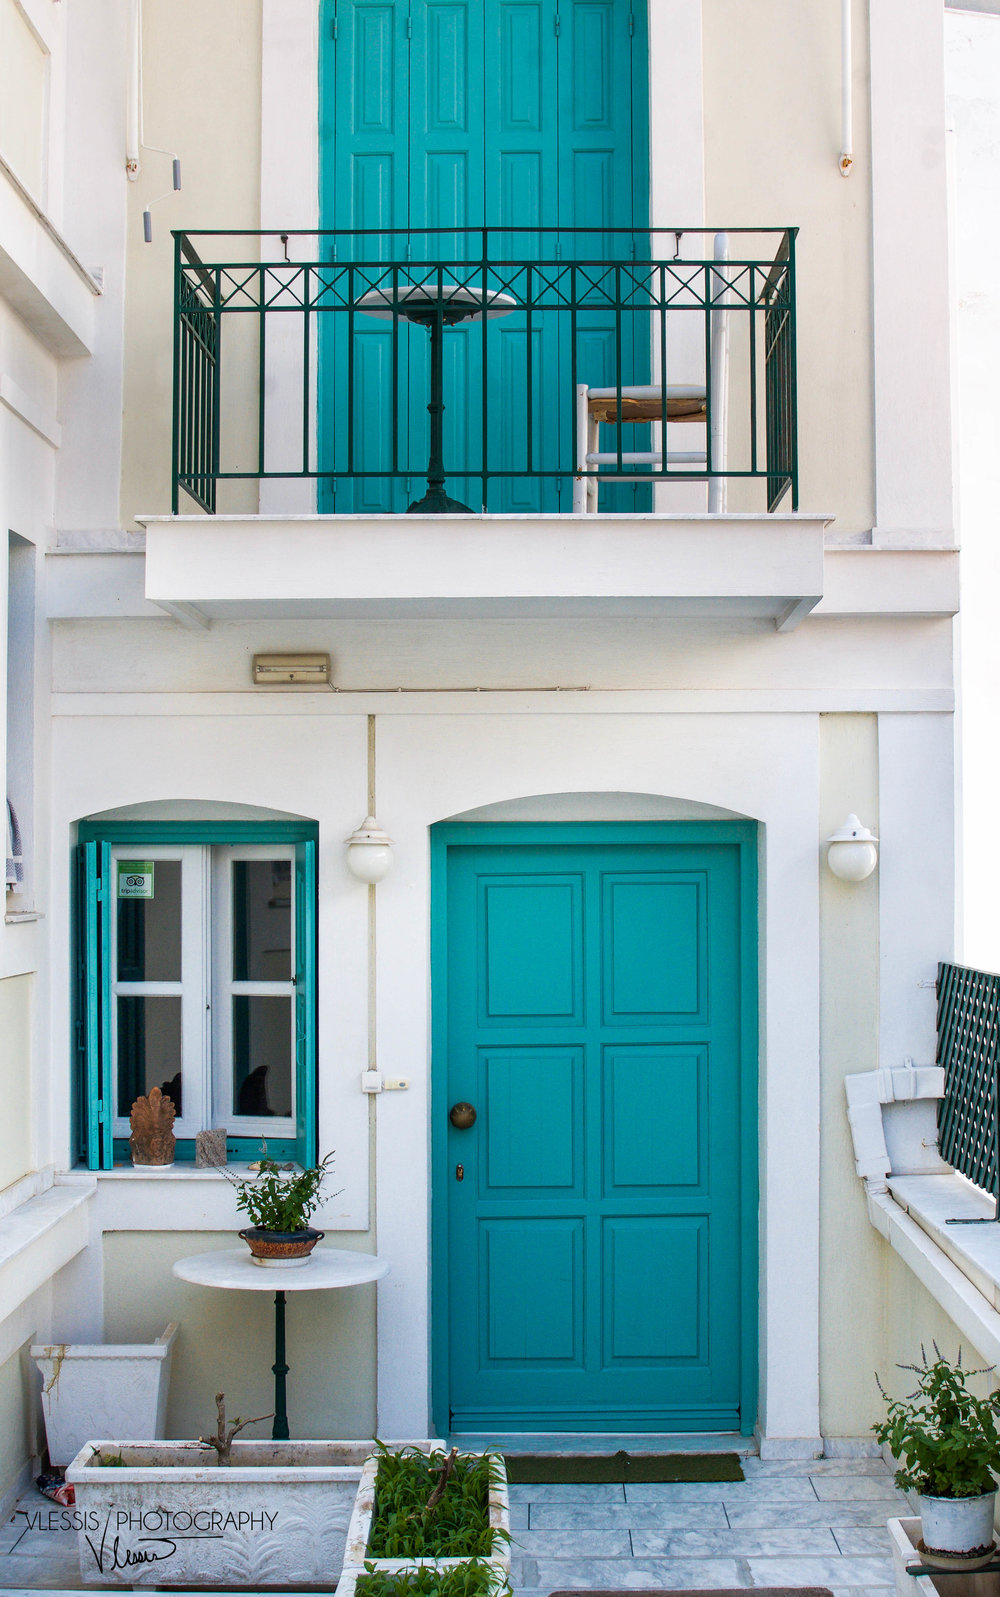 Greece (1 of 1) copy 4.jpg